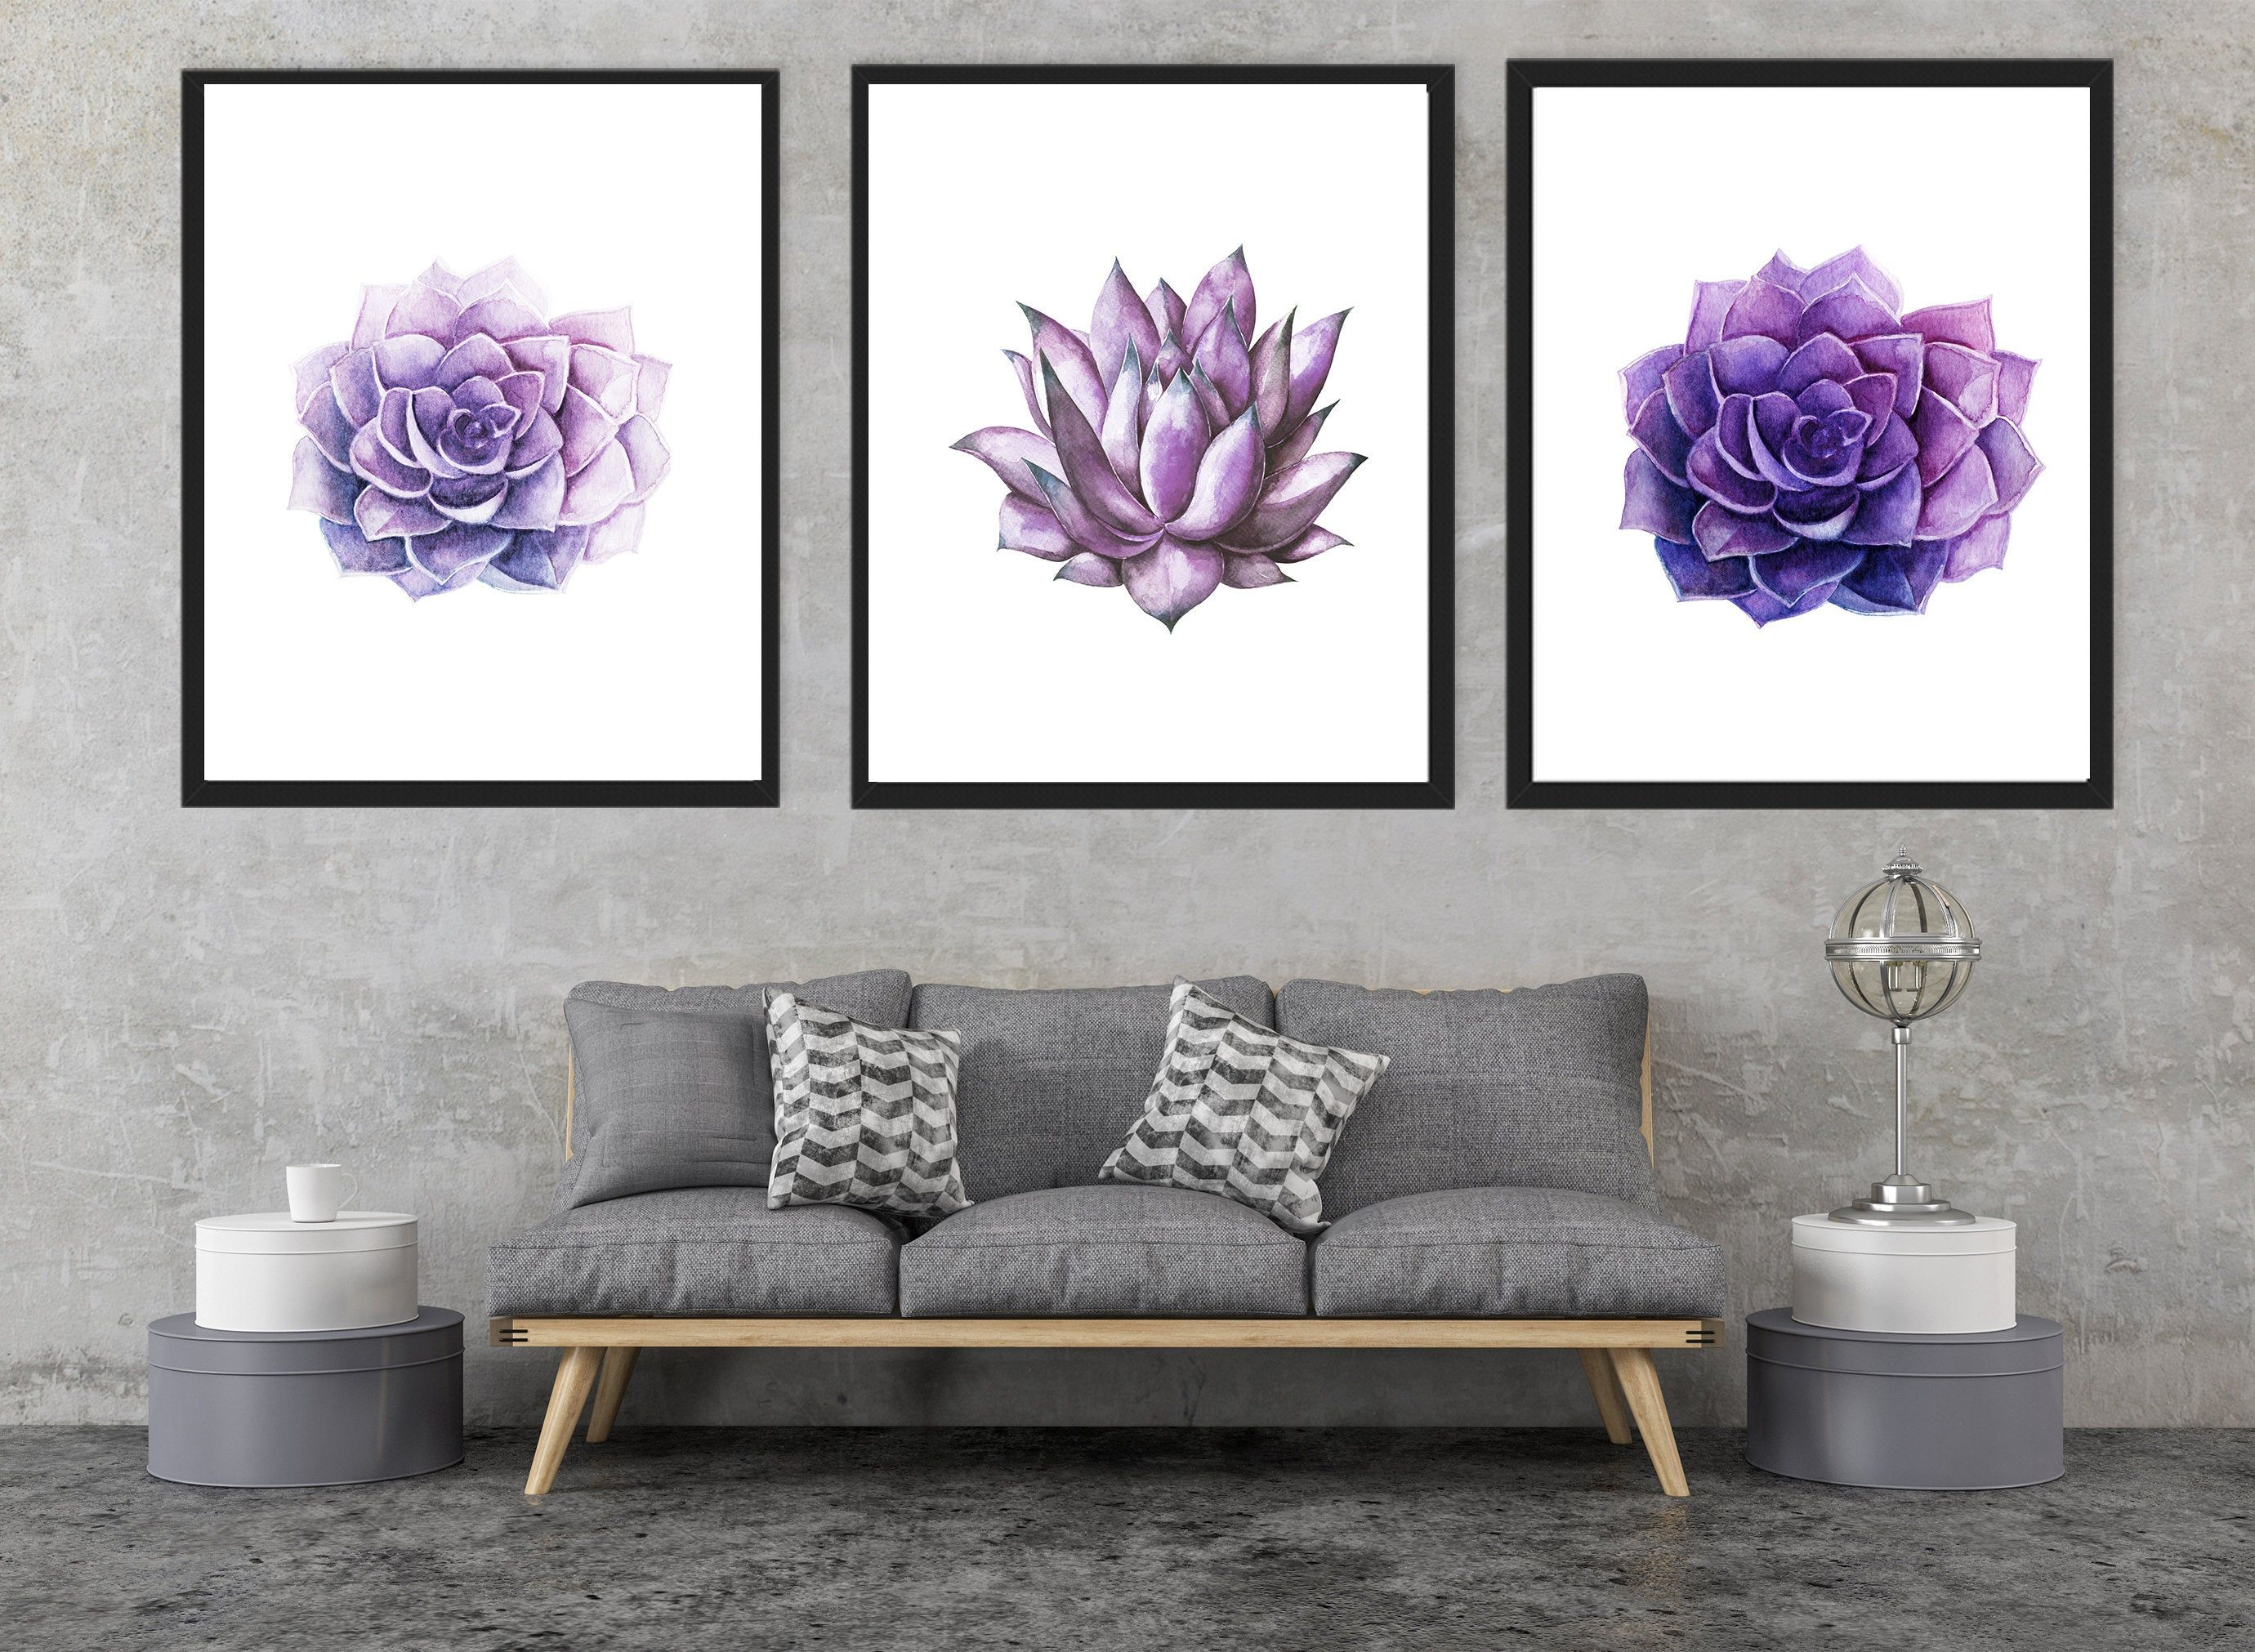 Purple Succulent Living Room Decor Purple Cactus Poster Etsy In 2020 Living Room Decor Purple Purple Decor Living Room Decor #purple #accessories #for #living #room